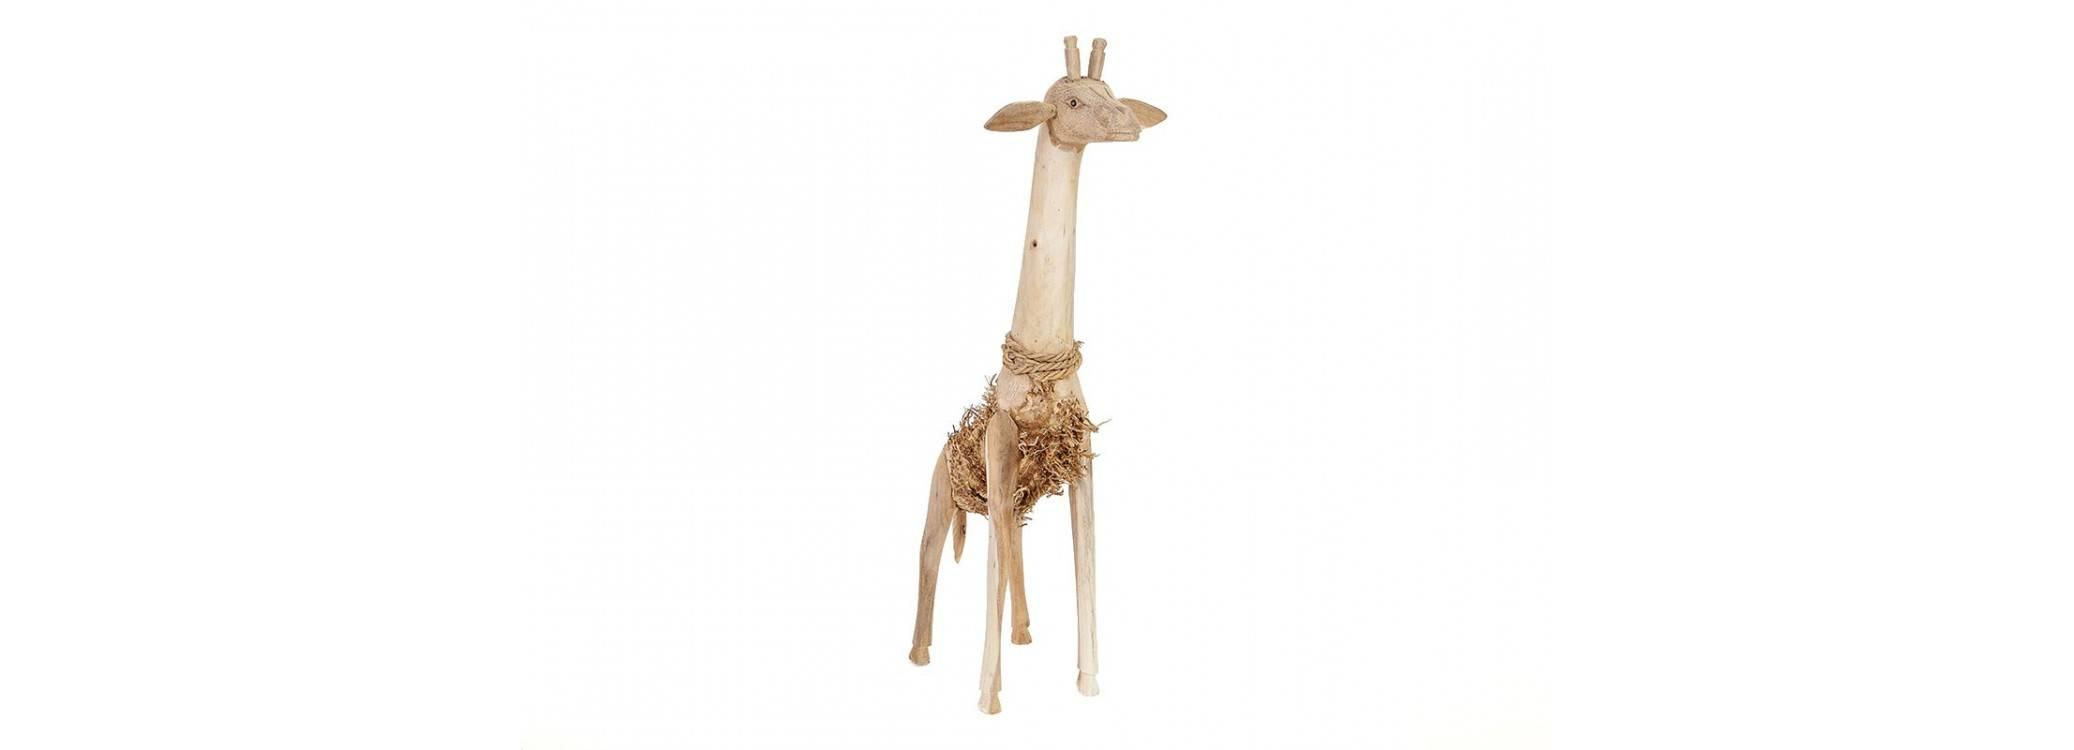 Girafe, sculpture en bois. Artisanat du monde.